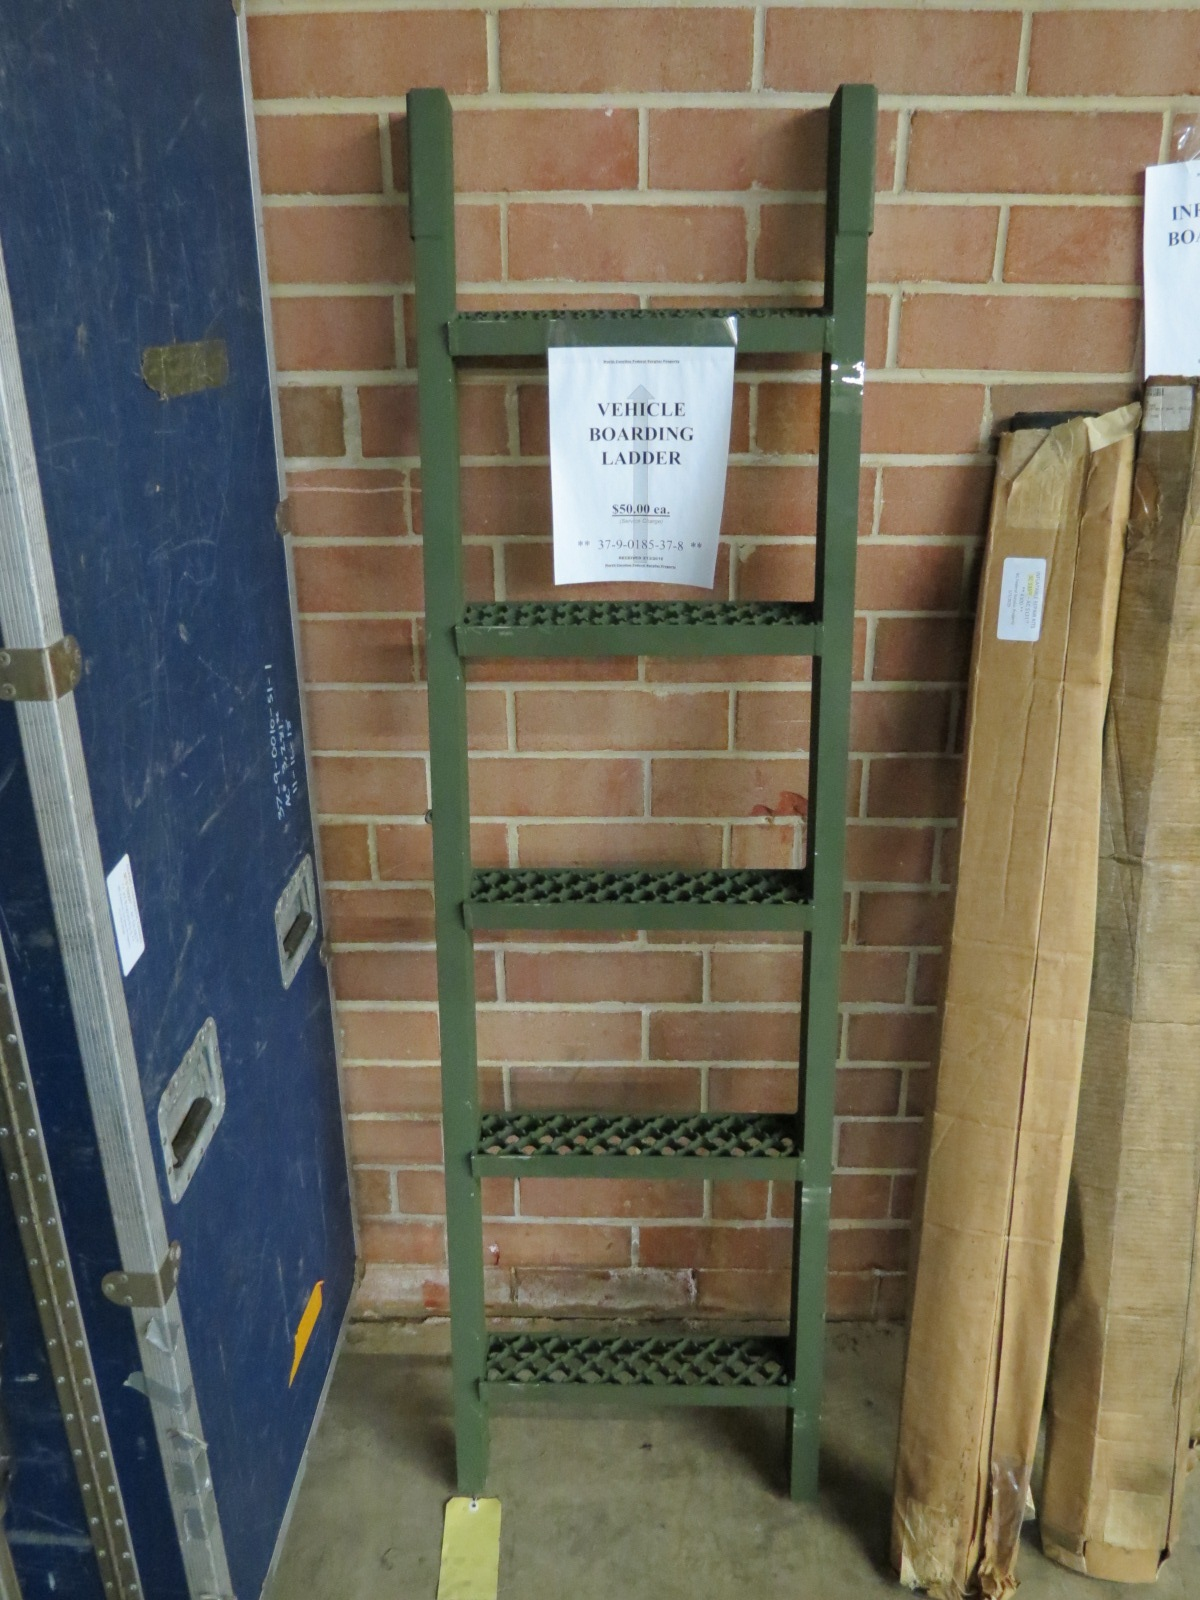 Vehicle Boarding Ladder